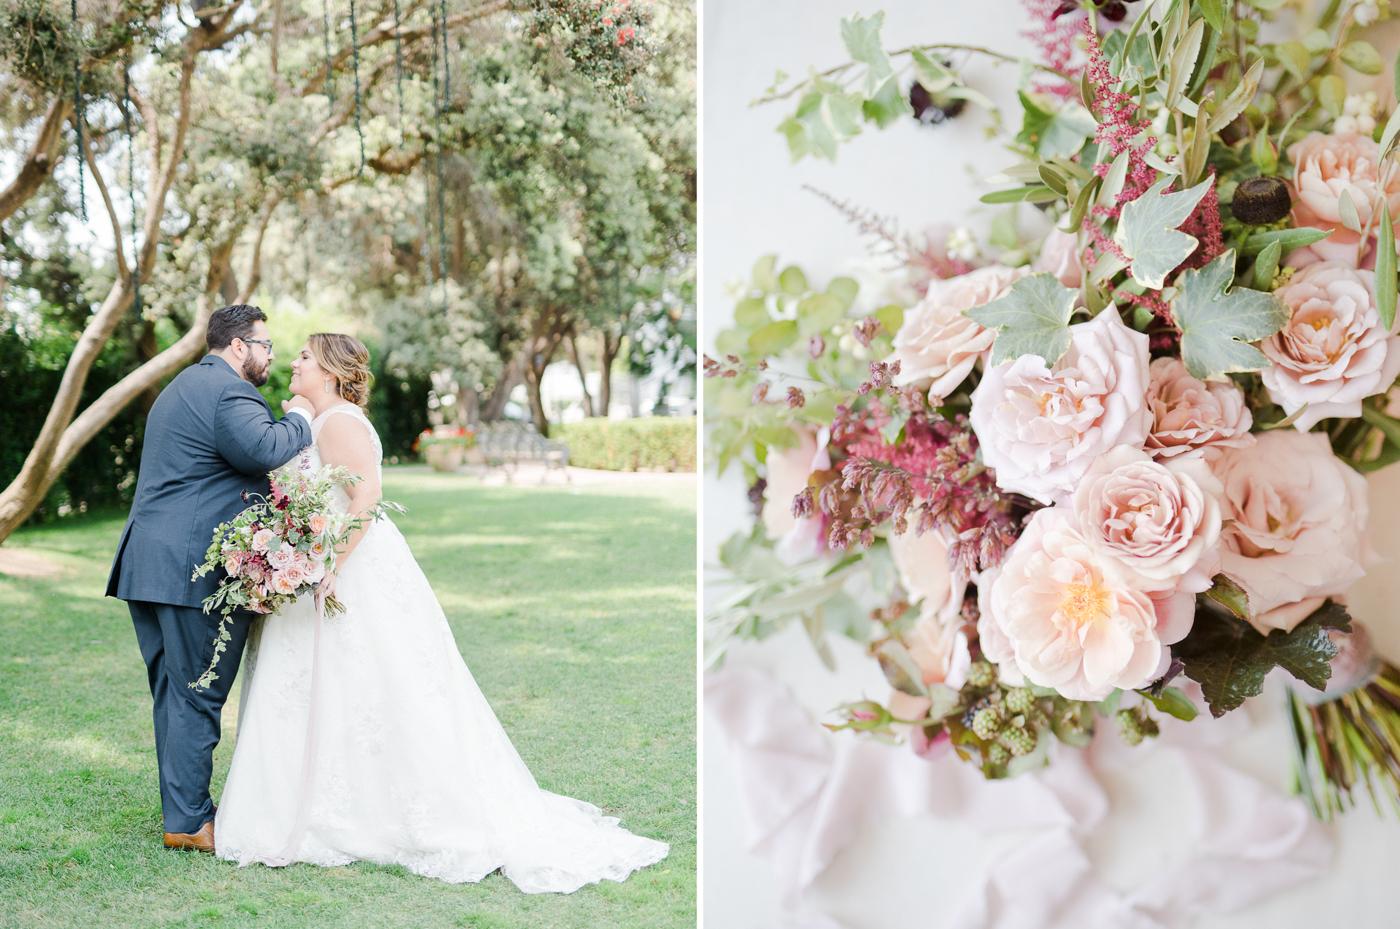 AKP_The_Victorian_Santa_Monica_Wedding_Photographer_Los_Angeles-1.jpg